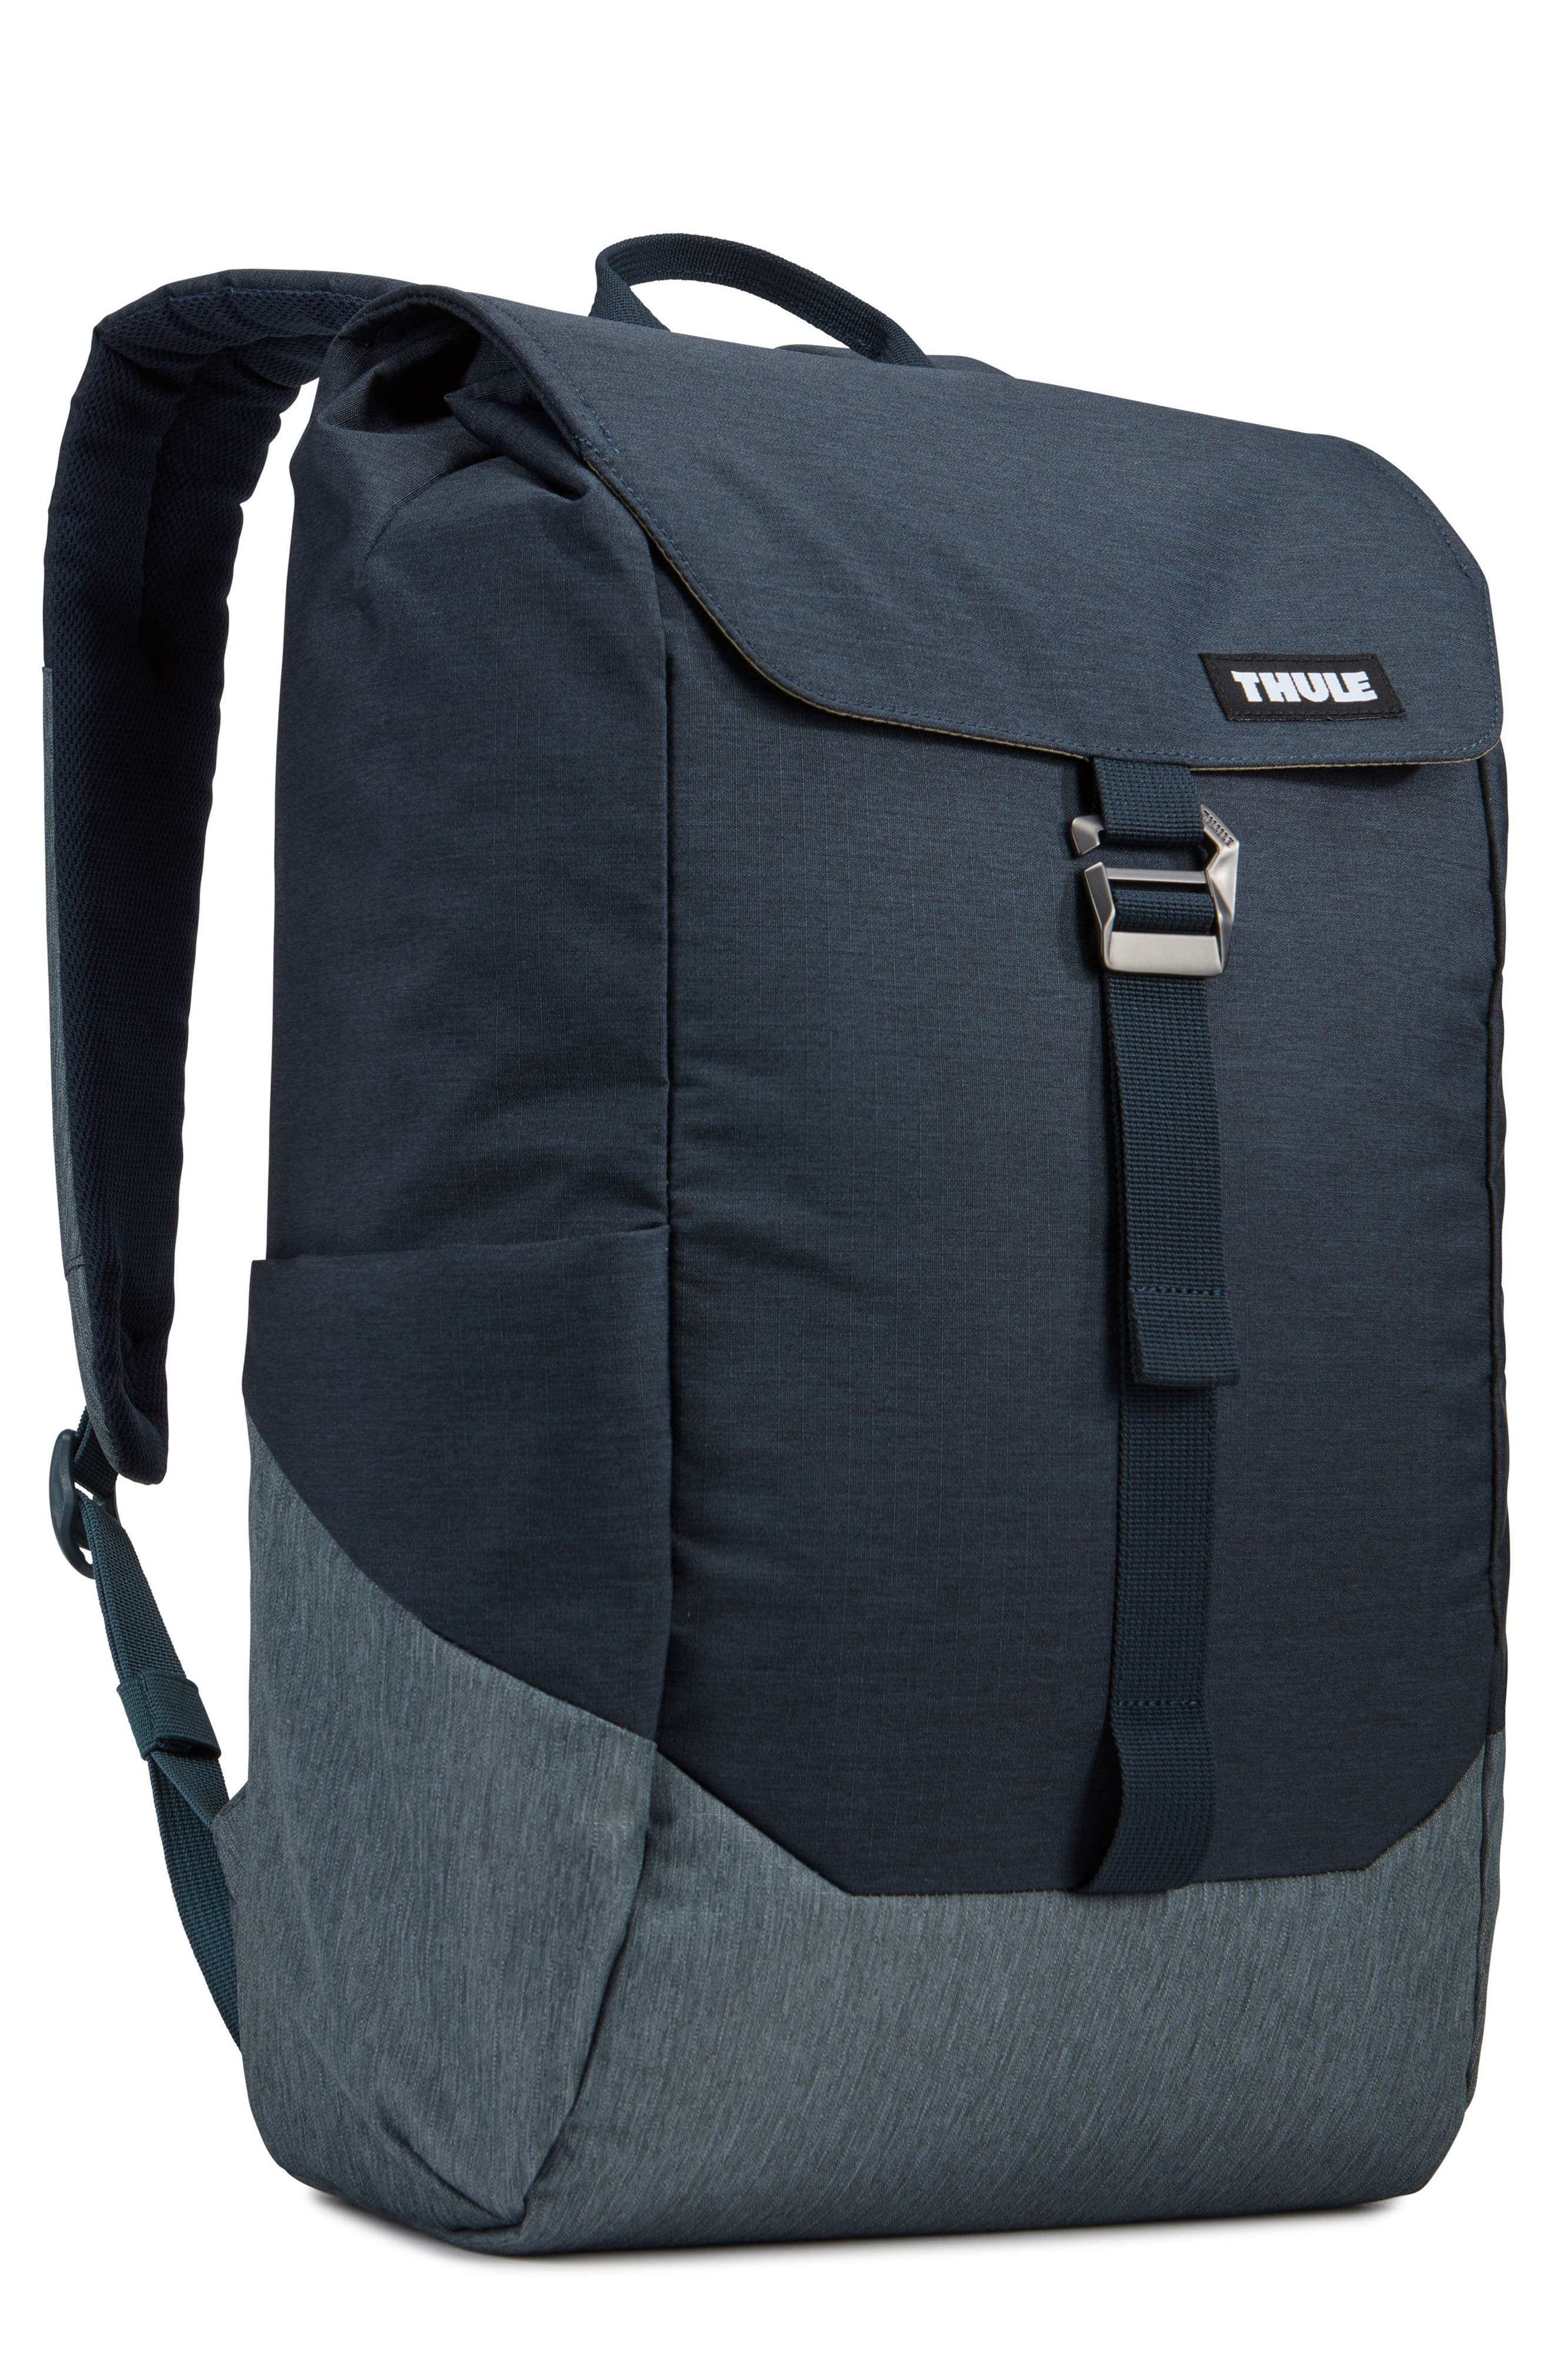 Lithos Backpack,                             Main thumbnail 1, color,                             CARBON BLUE